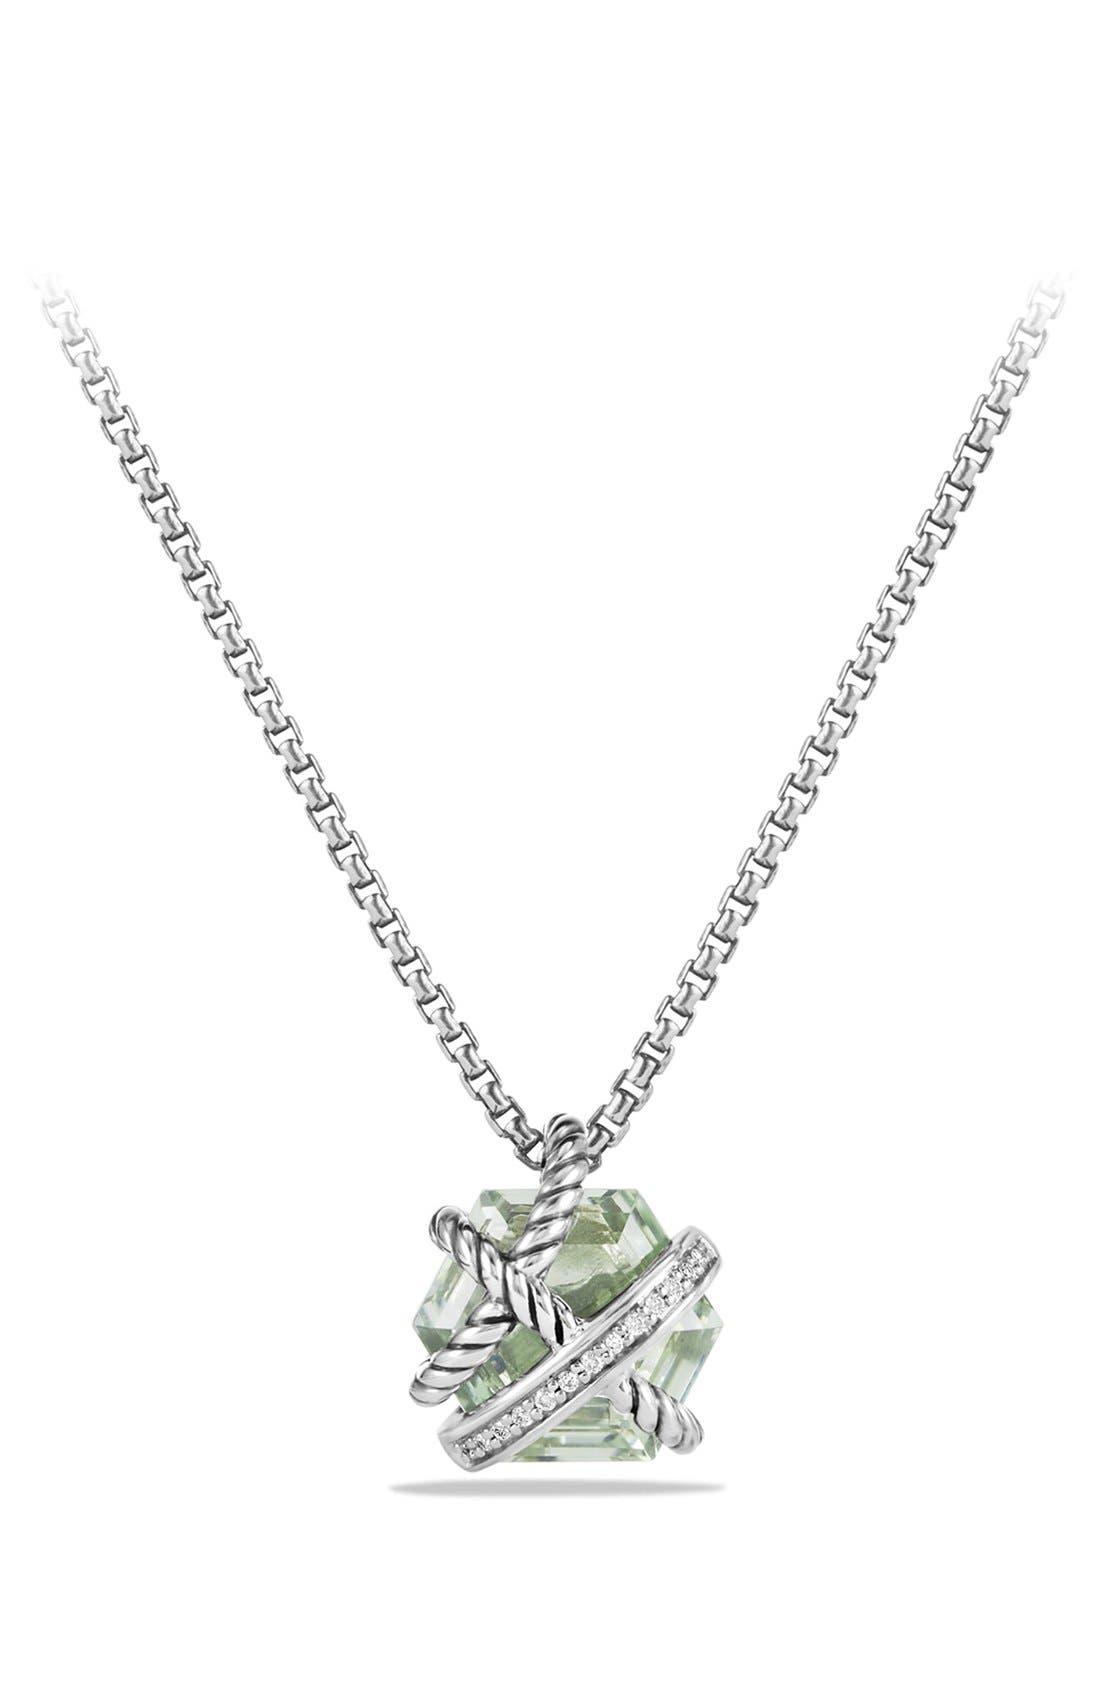 David Yurman 'Cable Wrap' Pendant Necklace with Diamonds